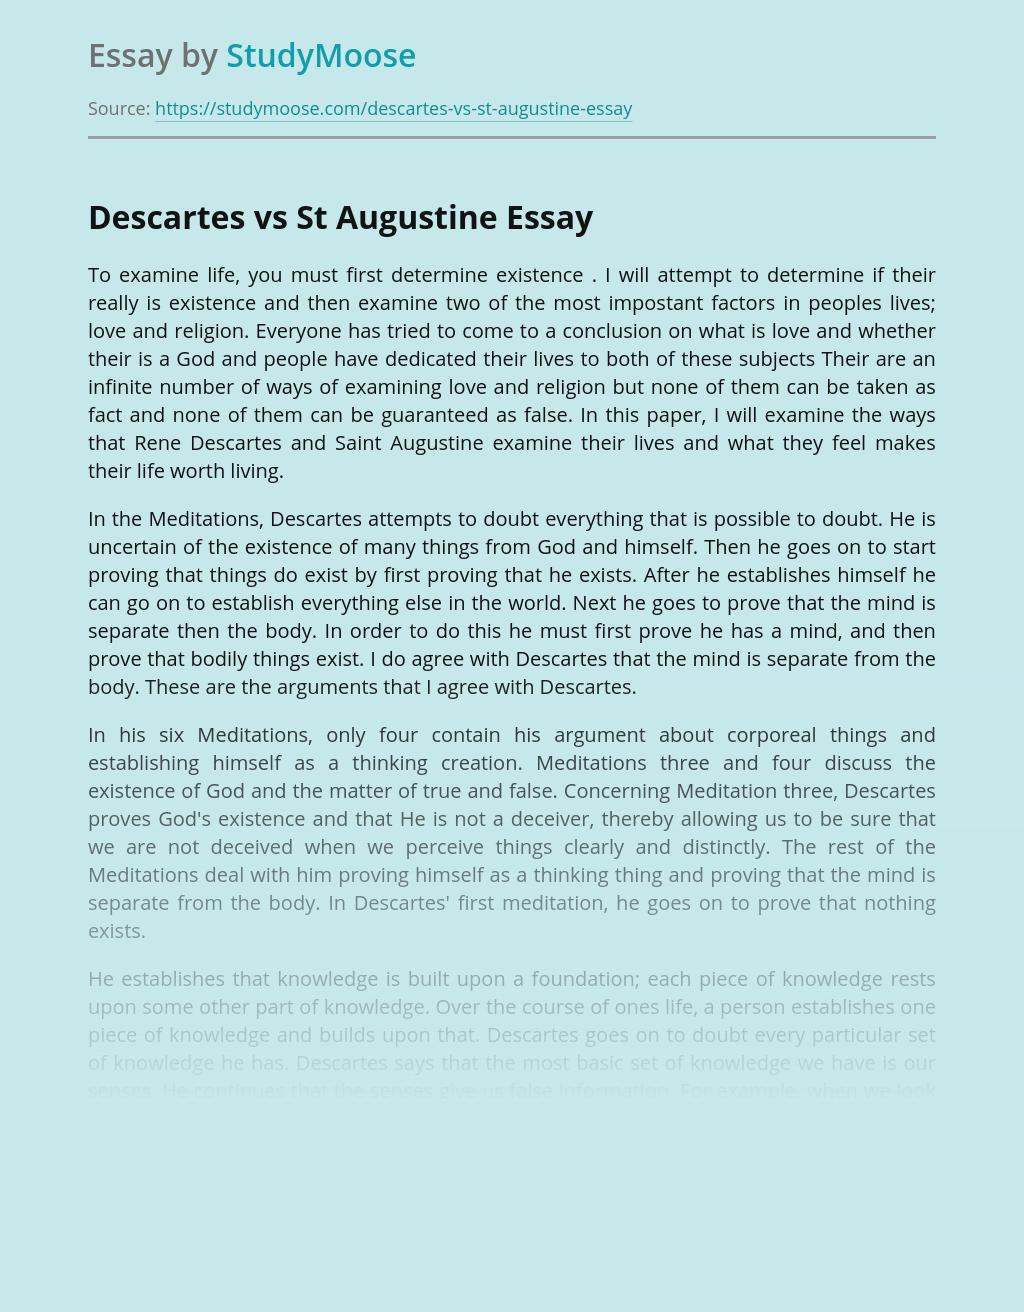 Comparison of Descartes' and St Augustine's Philosophies